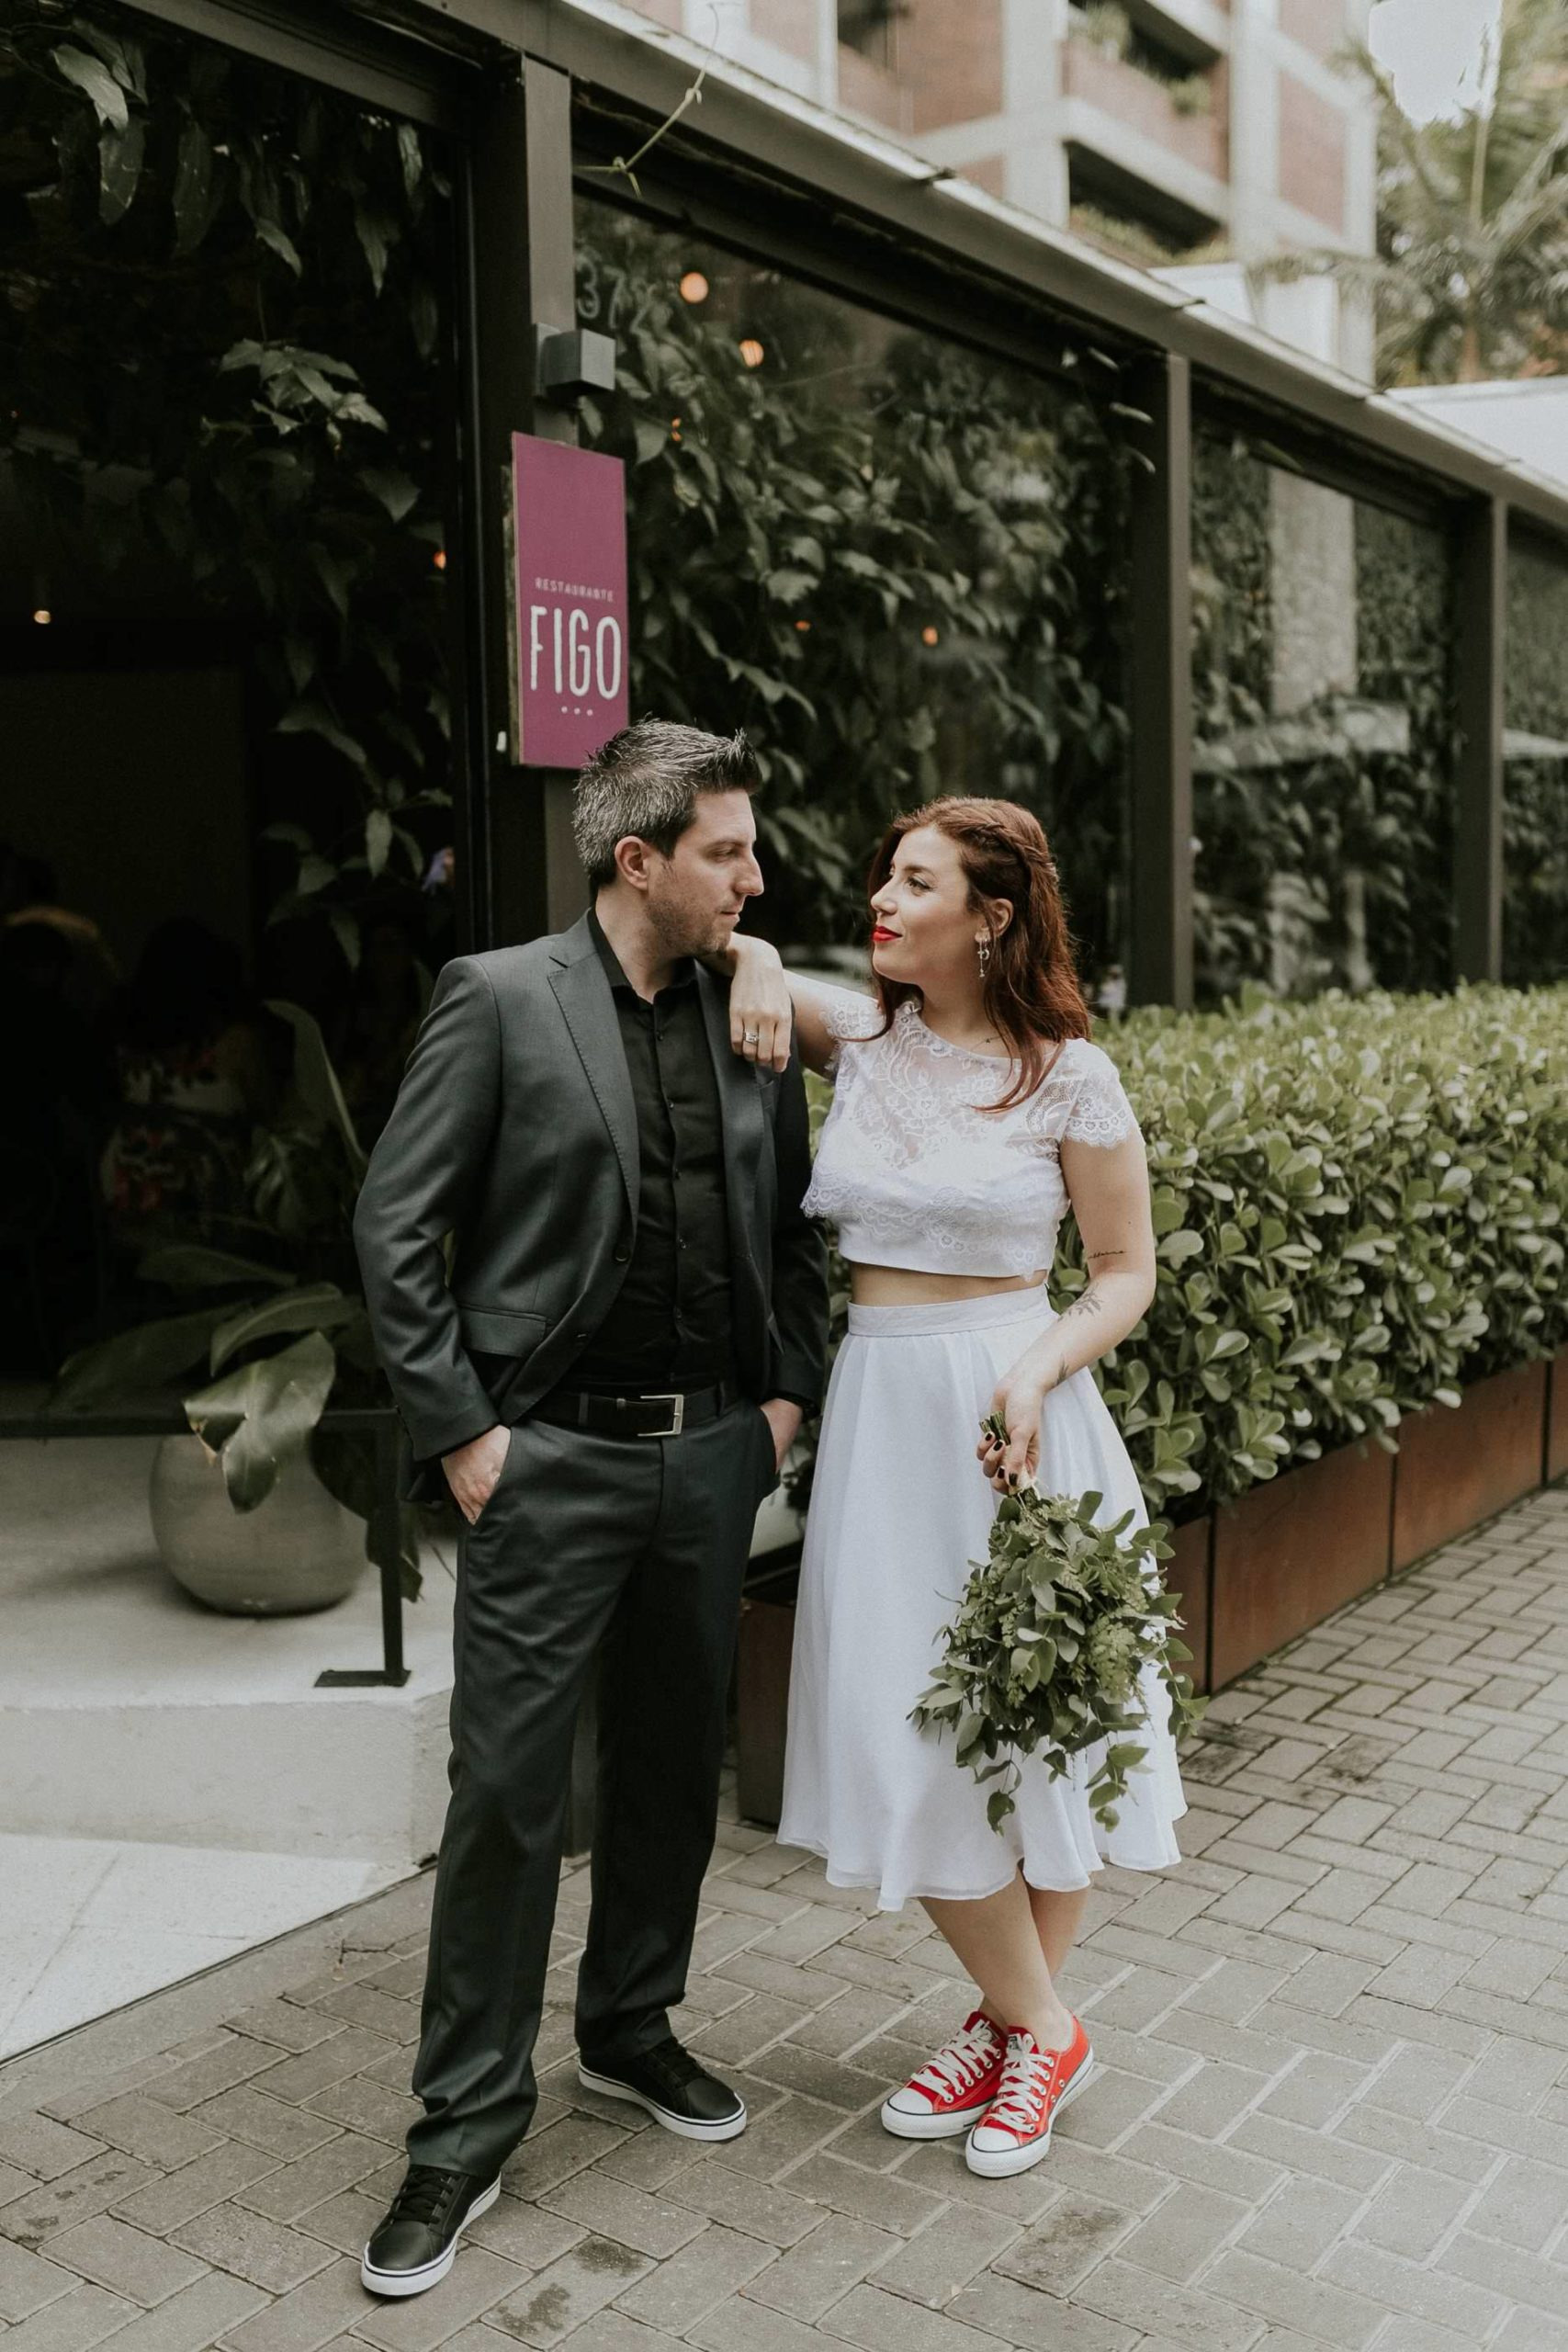 Mini-wedding urbano | Fotografia Minimalista | Karine Britto